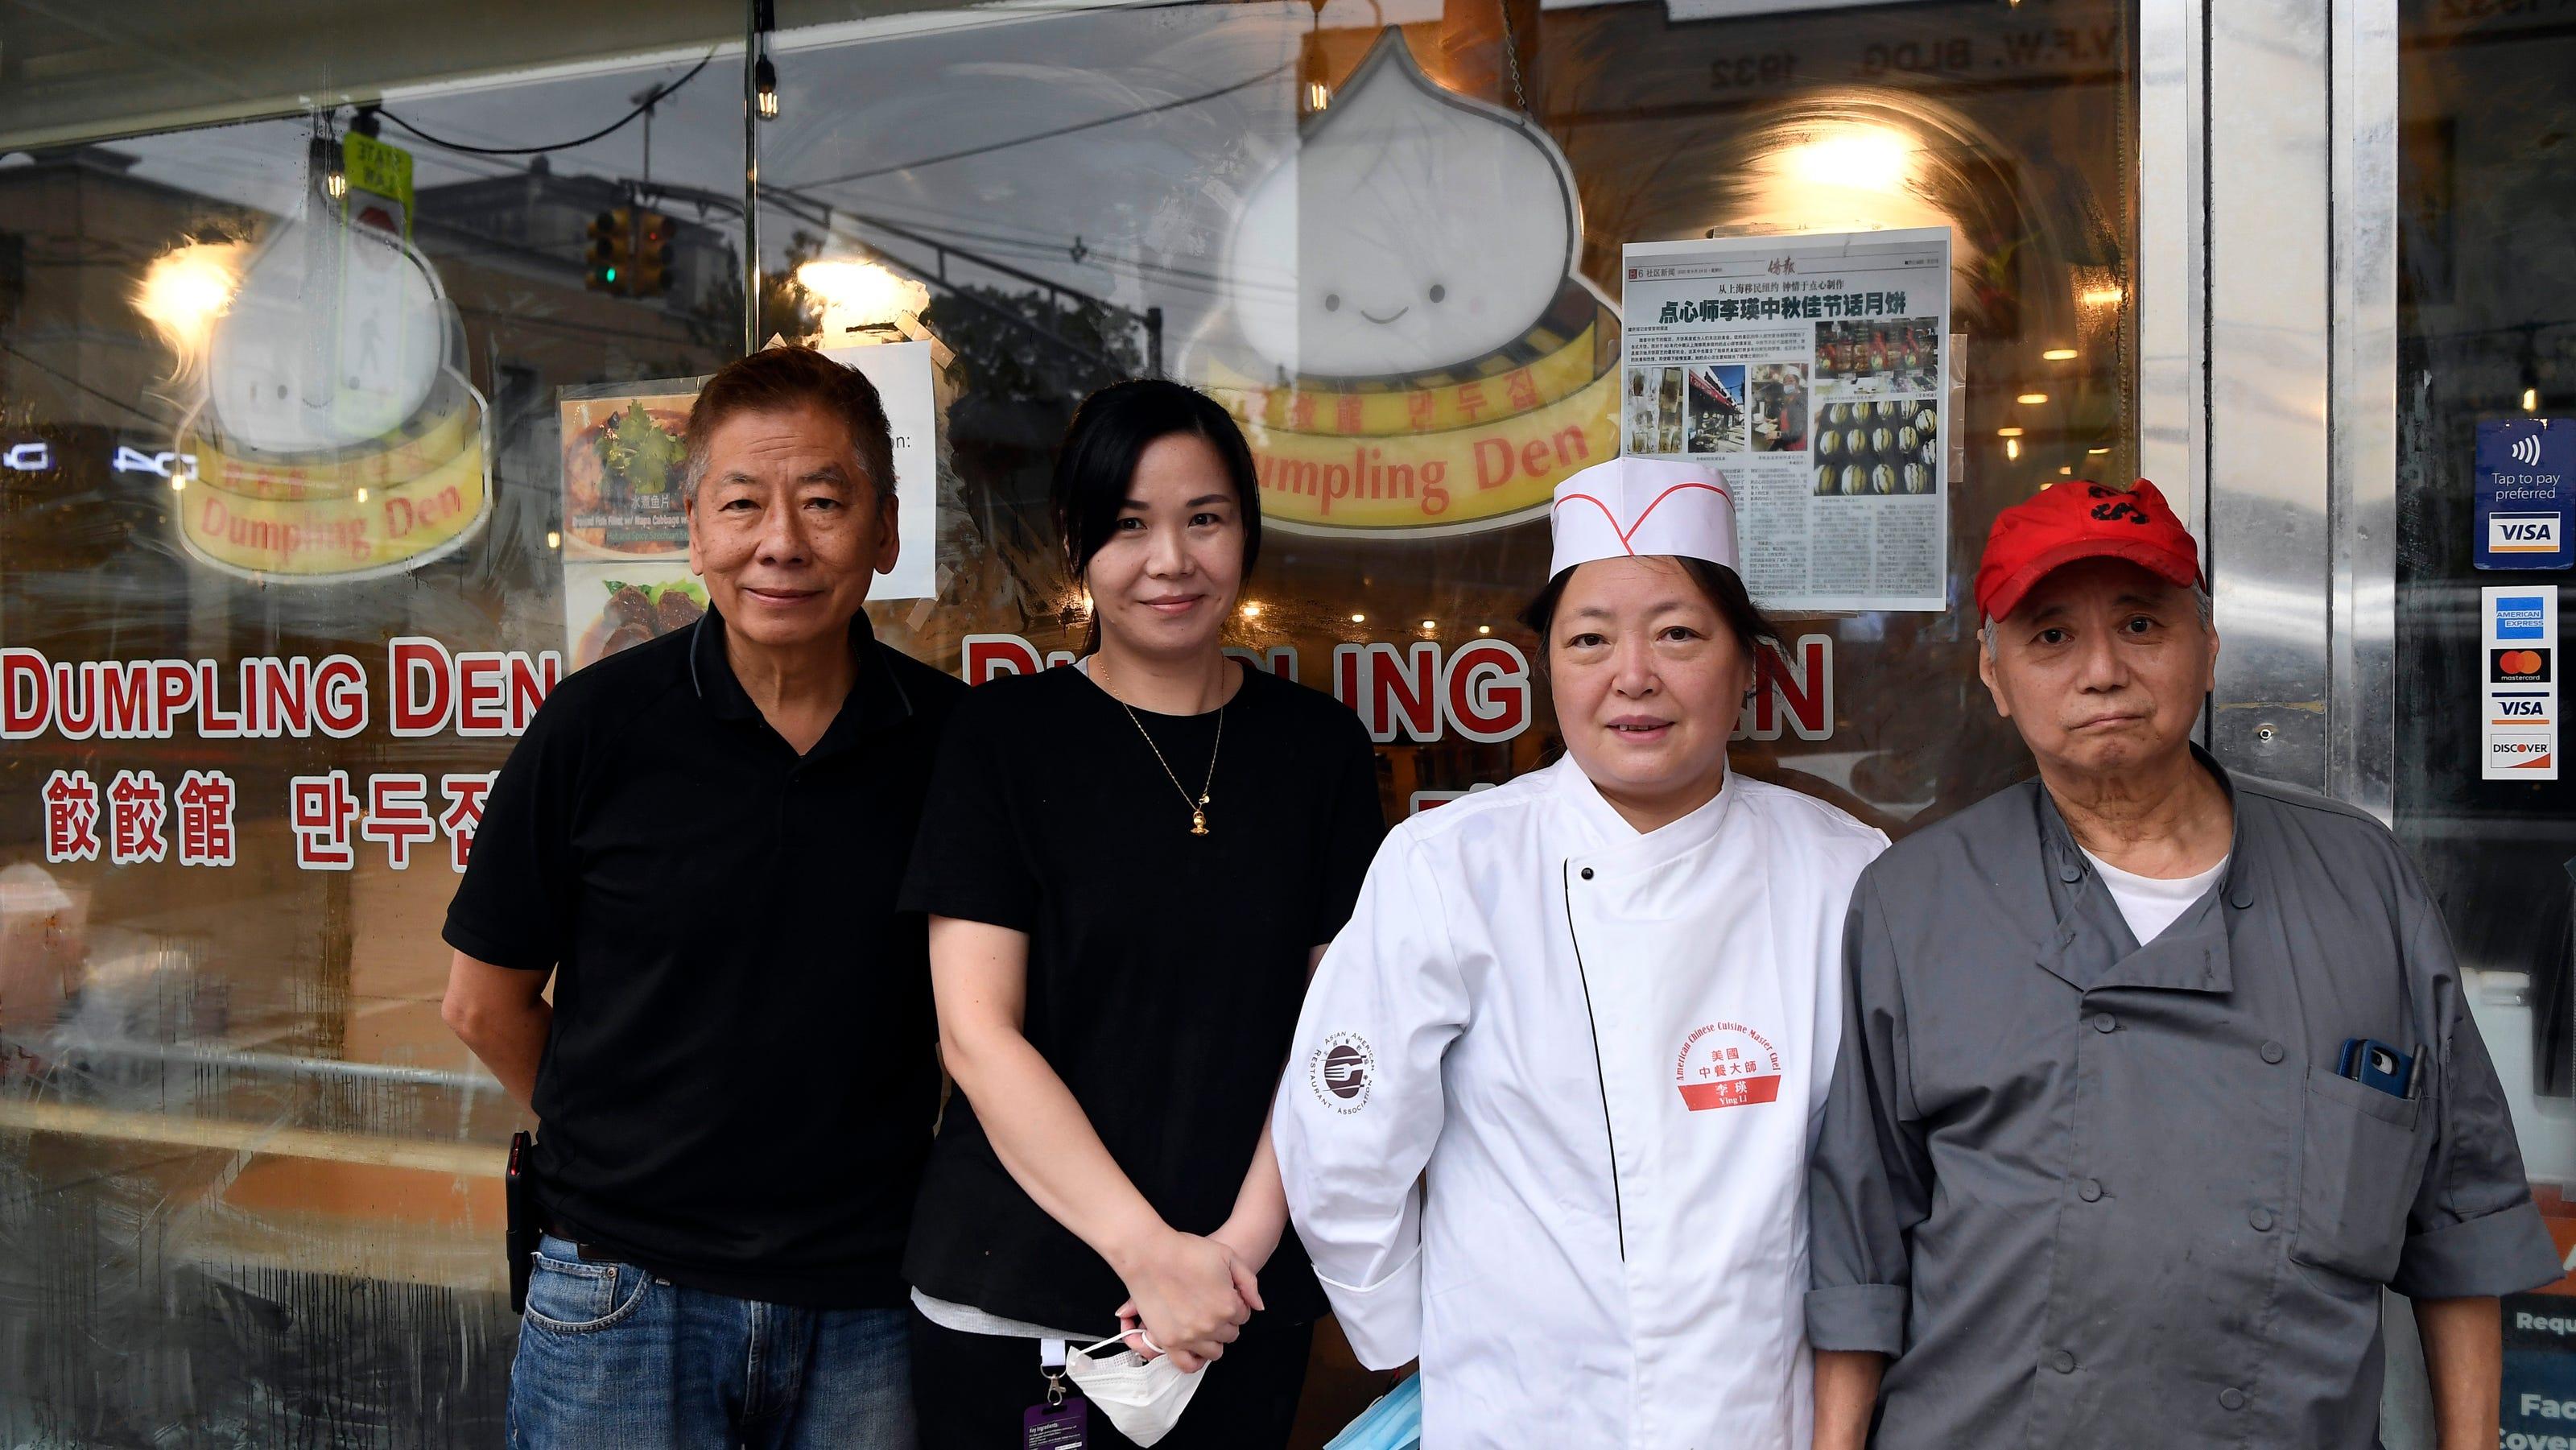 www.northjersey.com: Food drive pickup highlights NJ Asians' struggles amid COVID, dispels 'model minority' myth